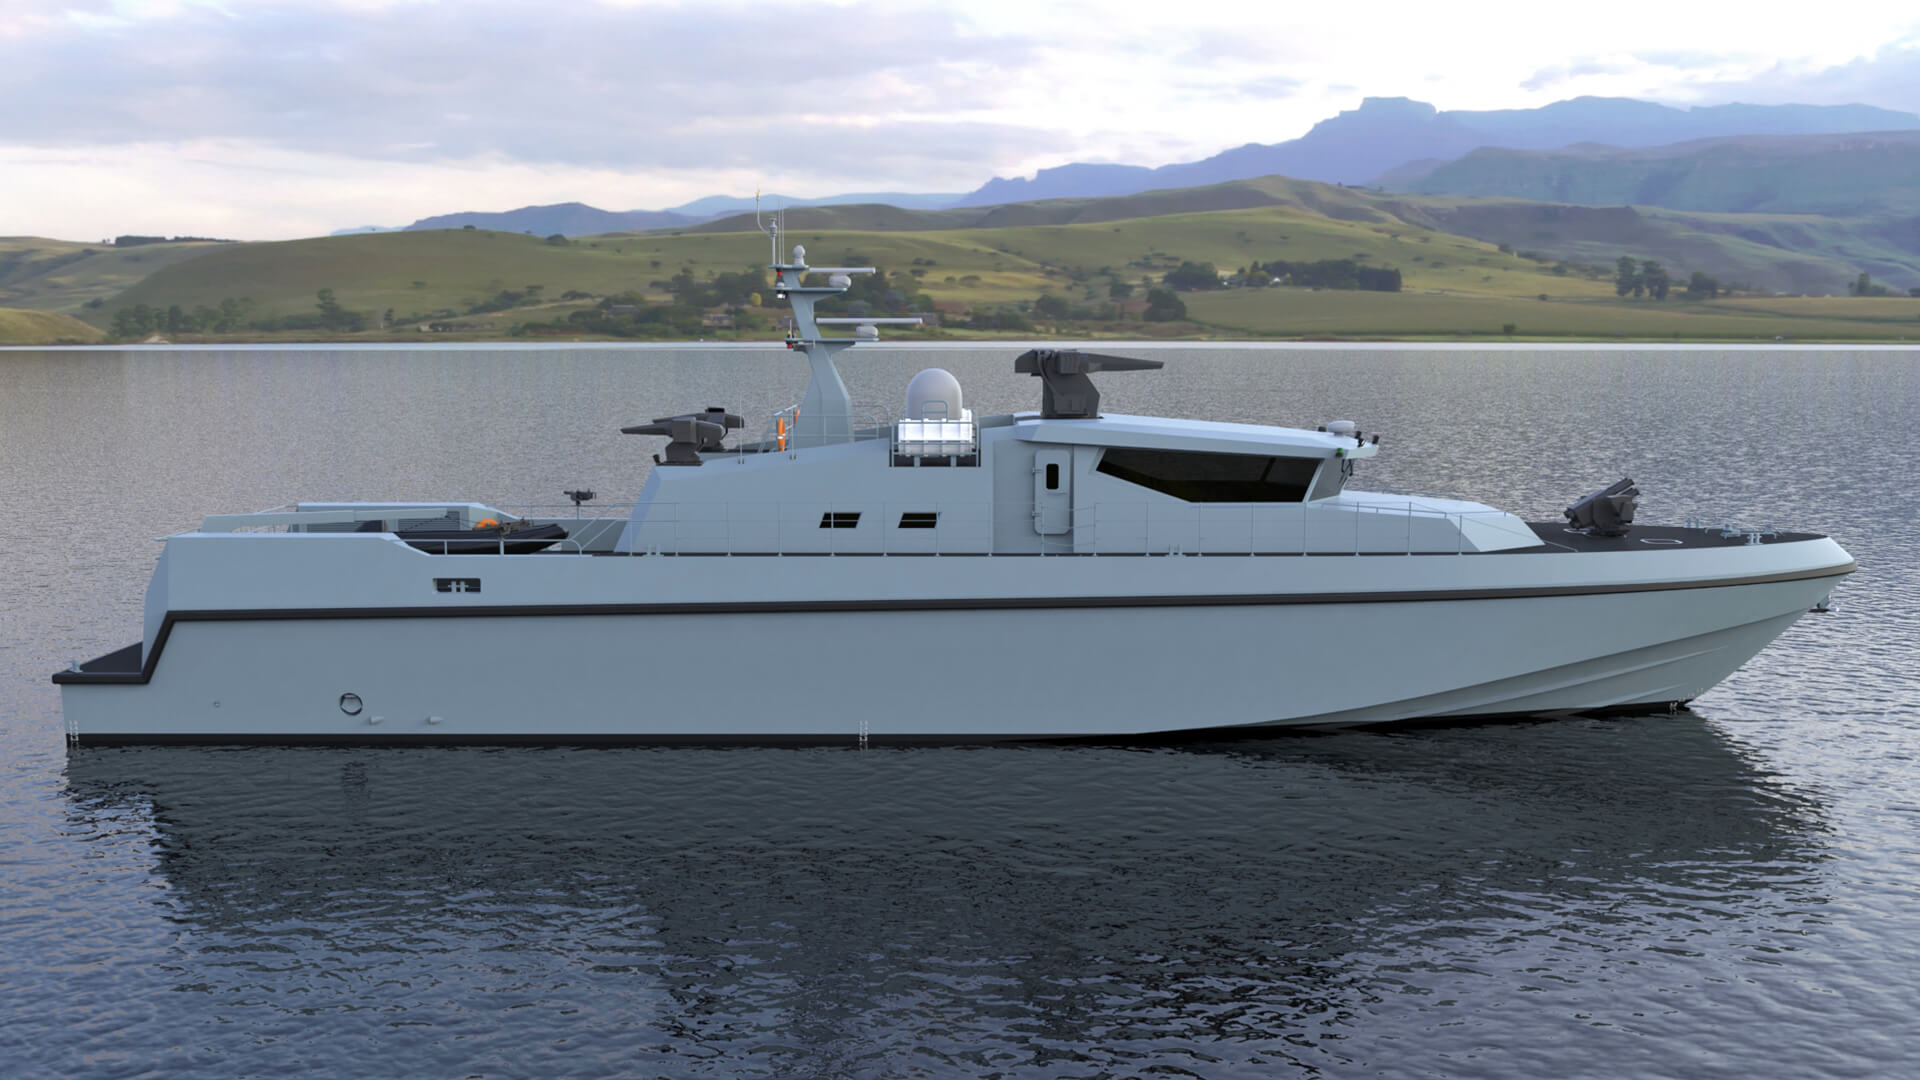 images/vessels/02-naval-craft/02-sat-series/02-ares-115-sat/02_1622809153.jpeg